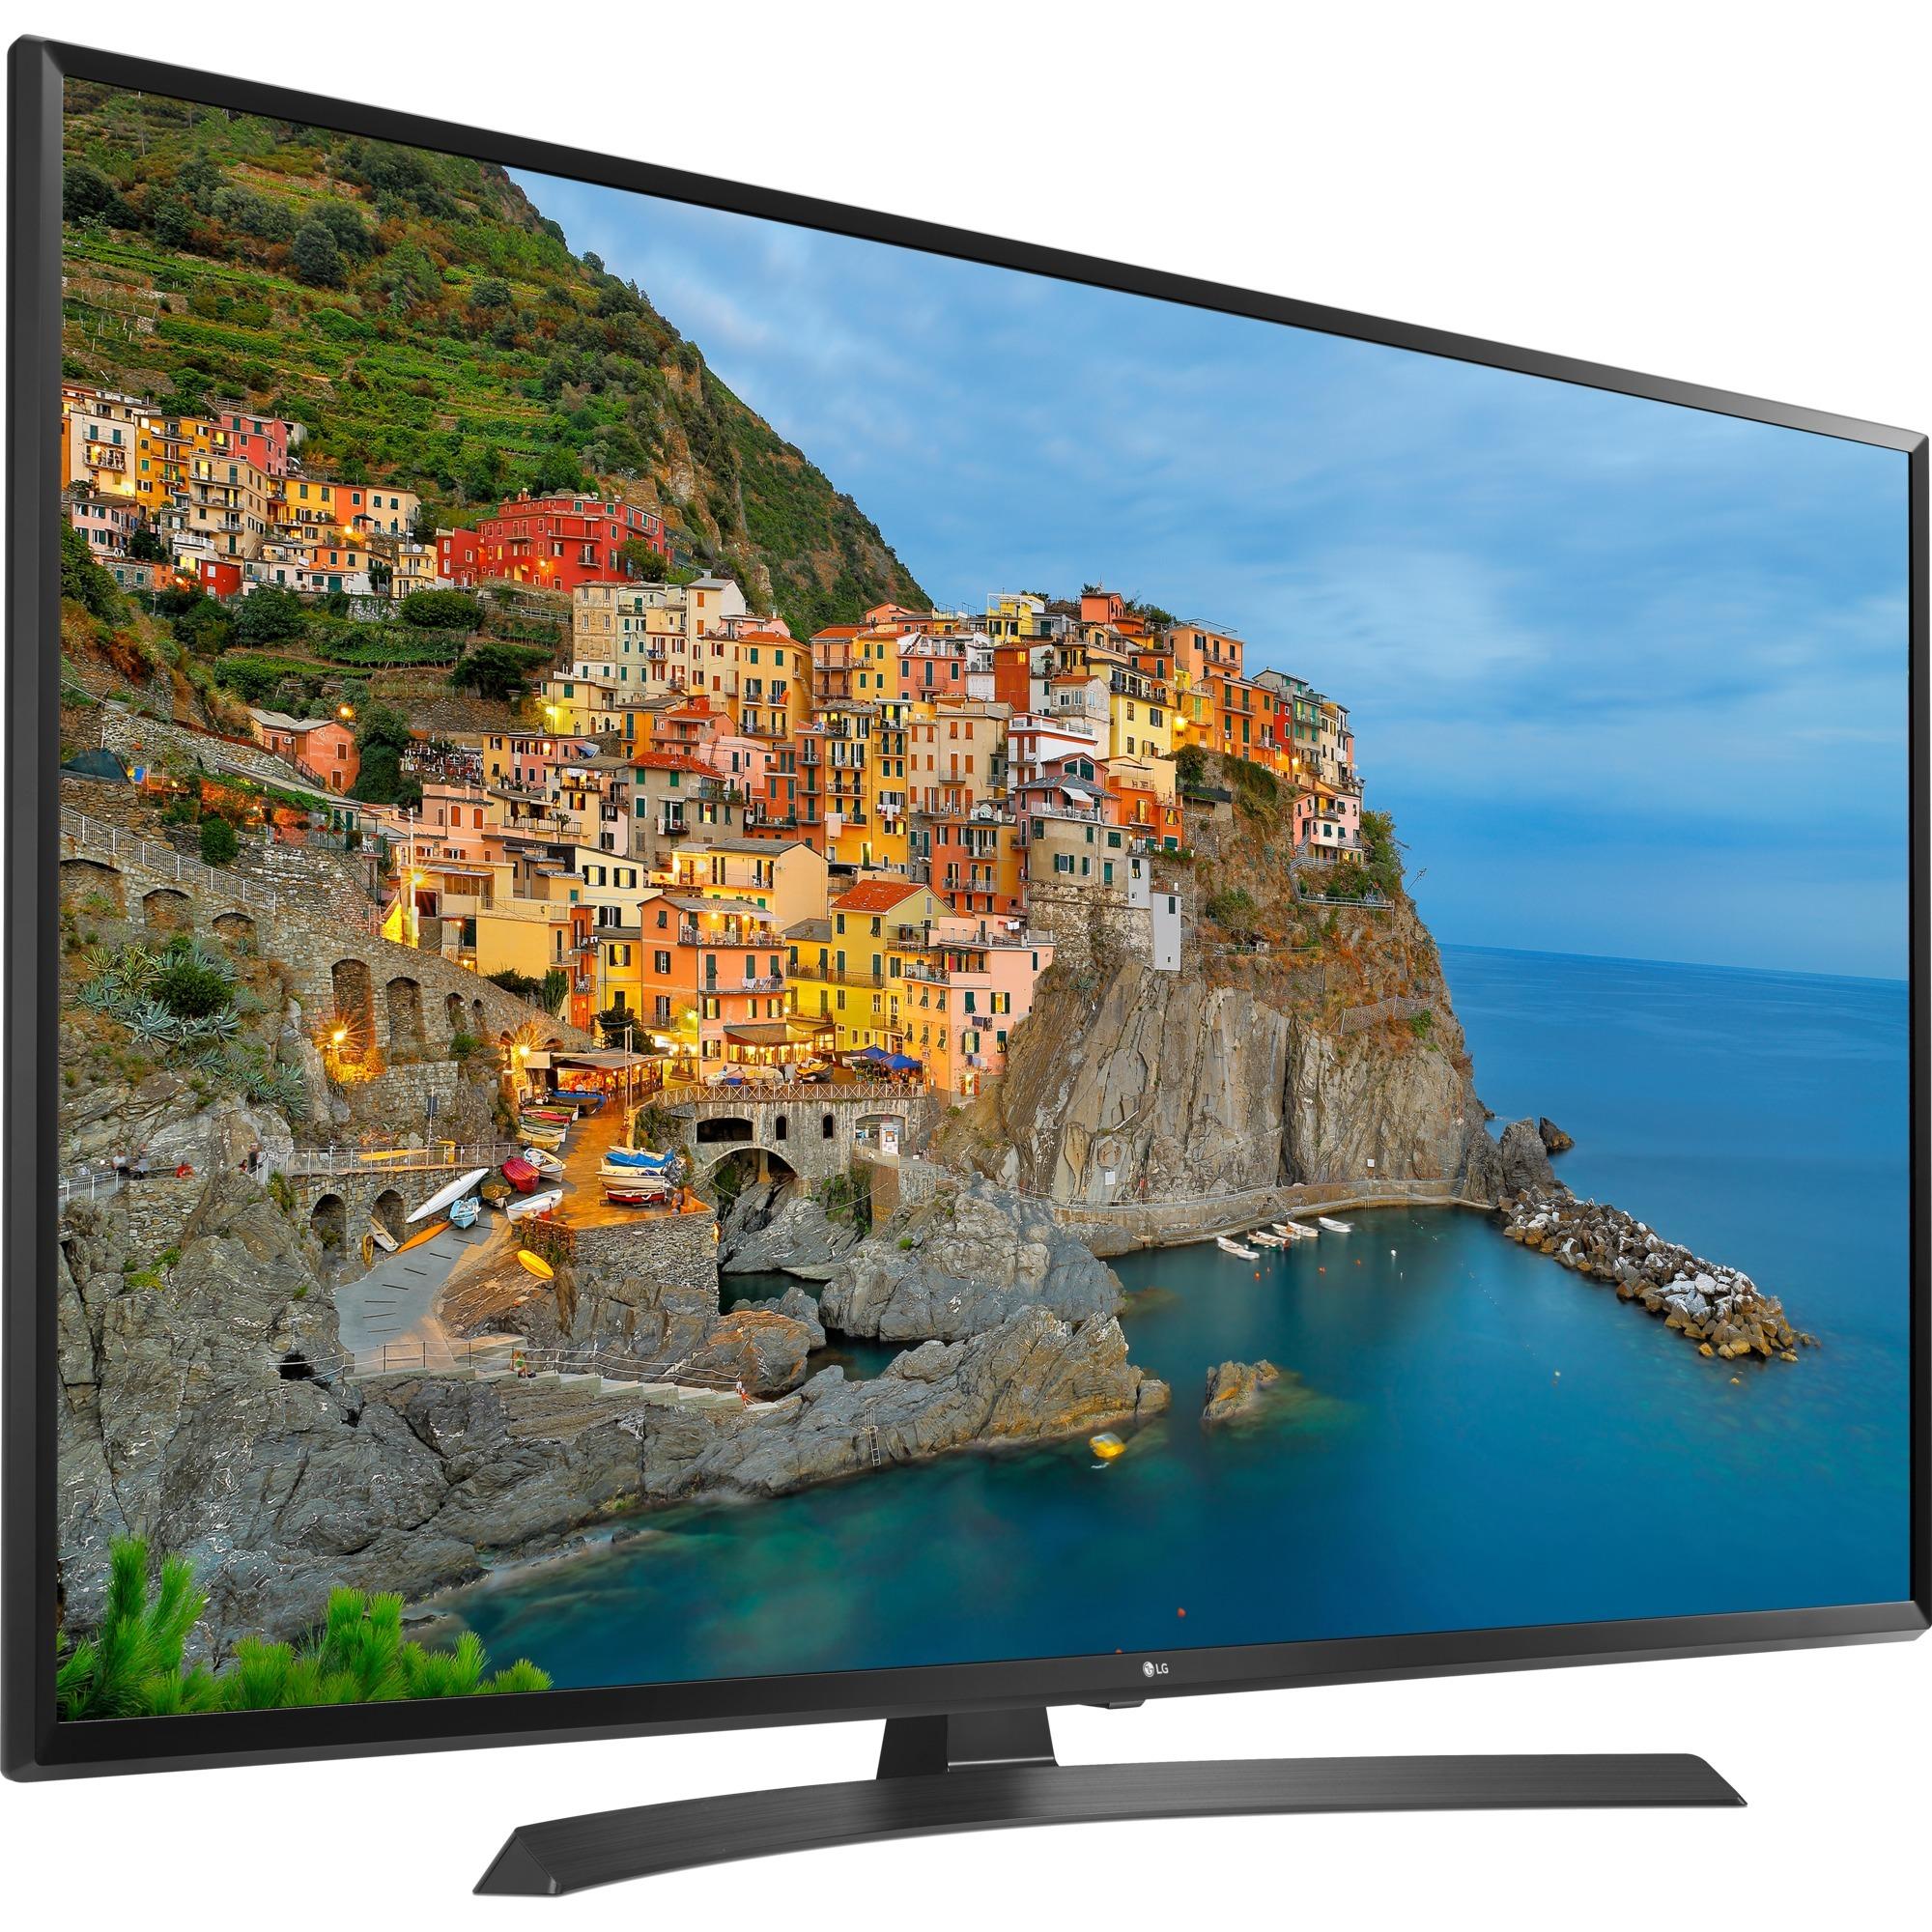 43UJ635V 43 4K Ultra HD Smart TV Wifi Noir écran LED, Téléviseur LED